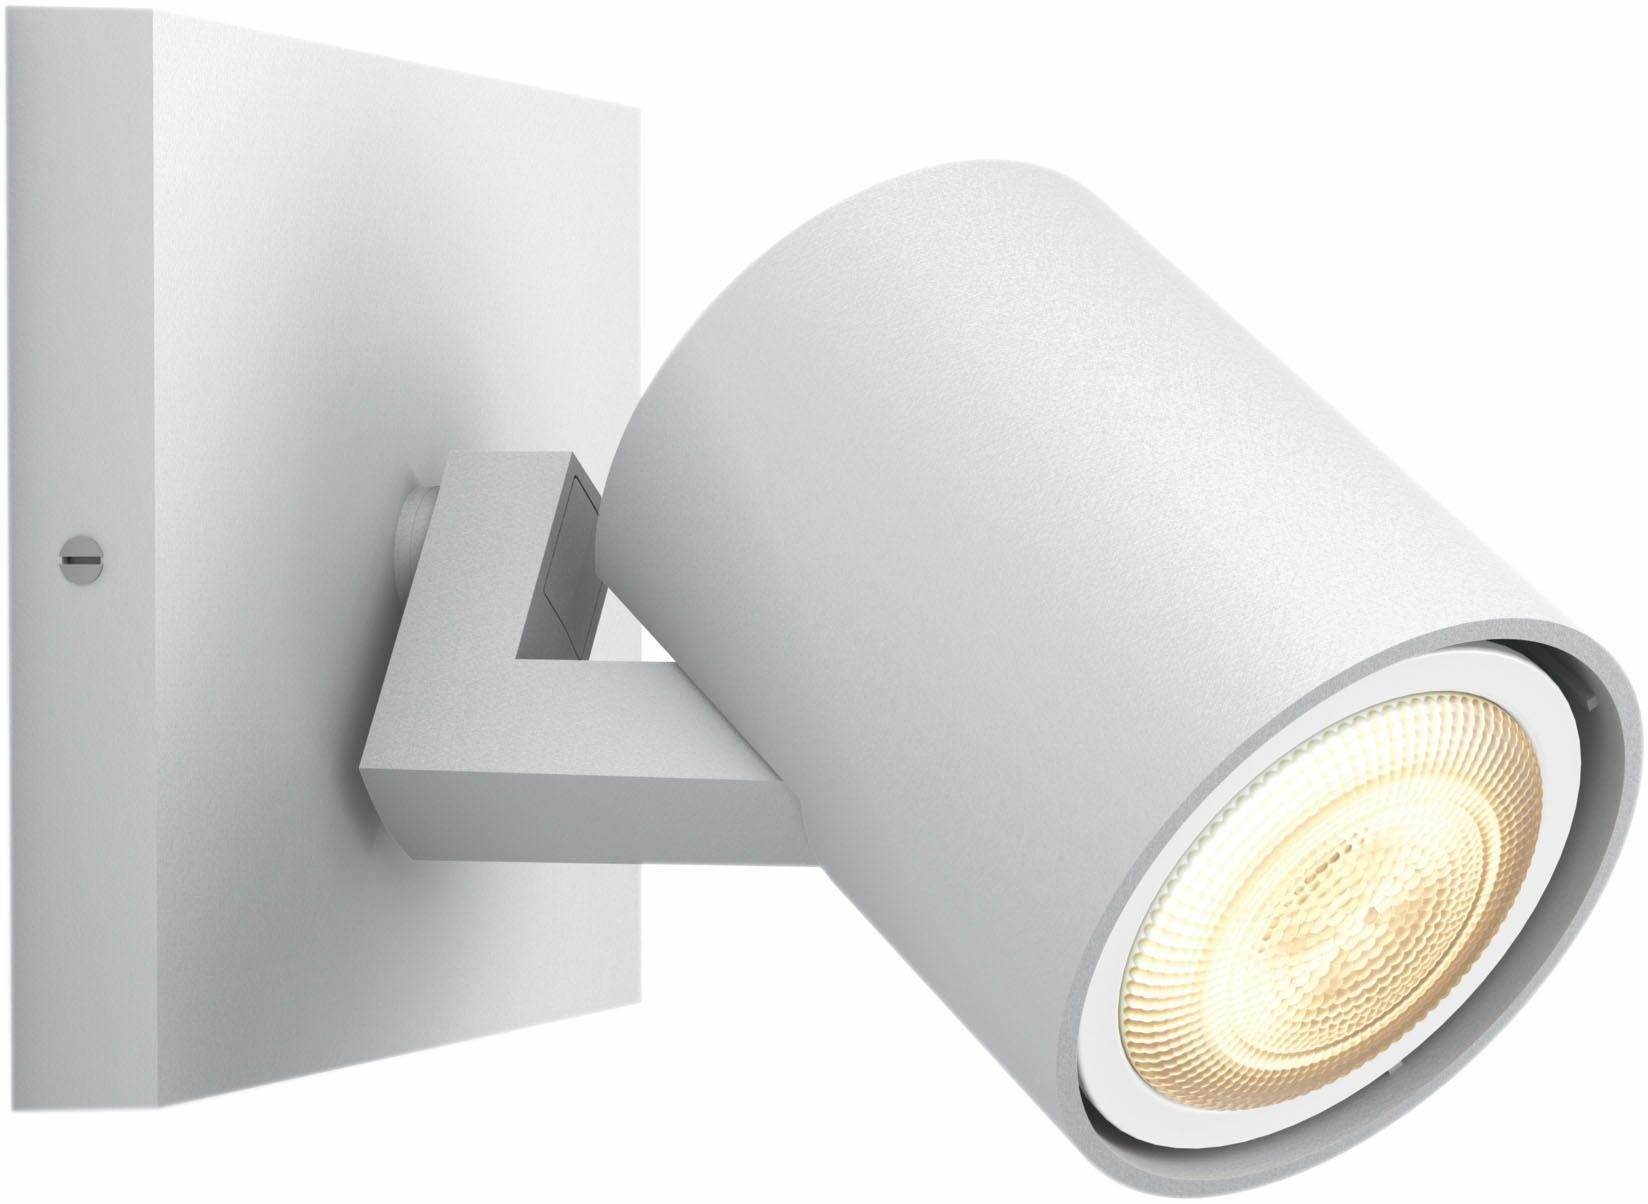 Philips Hue LED Wandstrahler »Runner«, 1-flammig, Smart Home